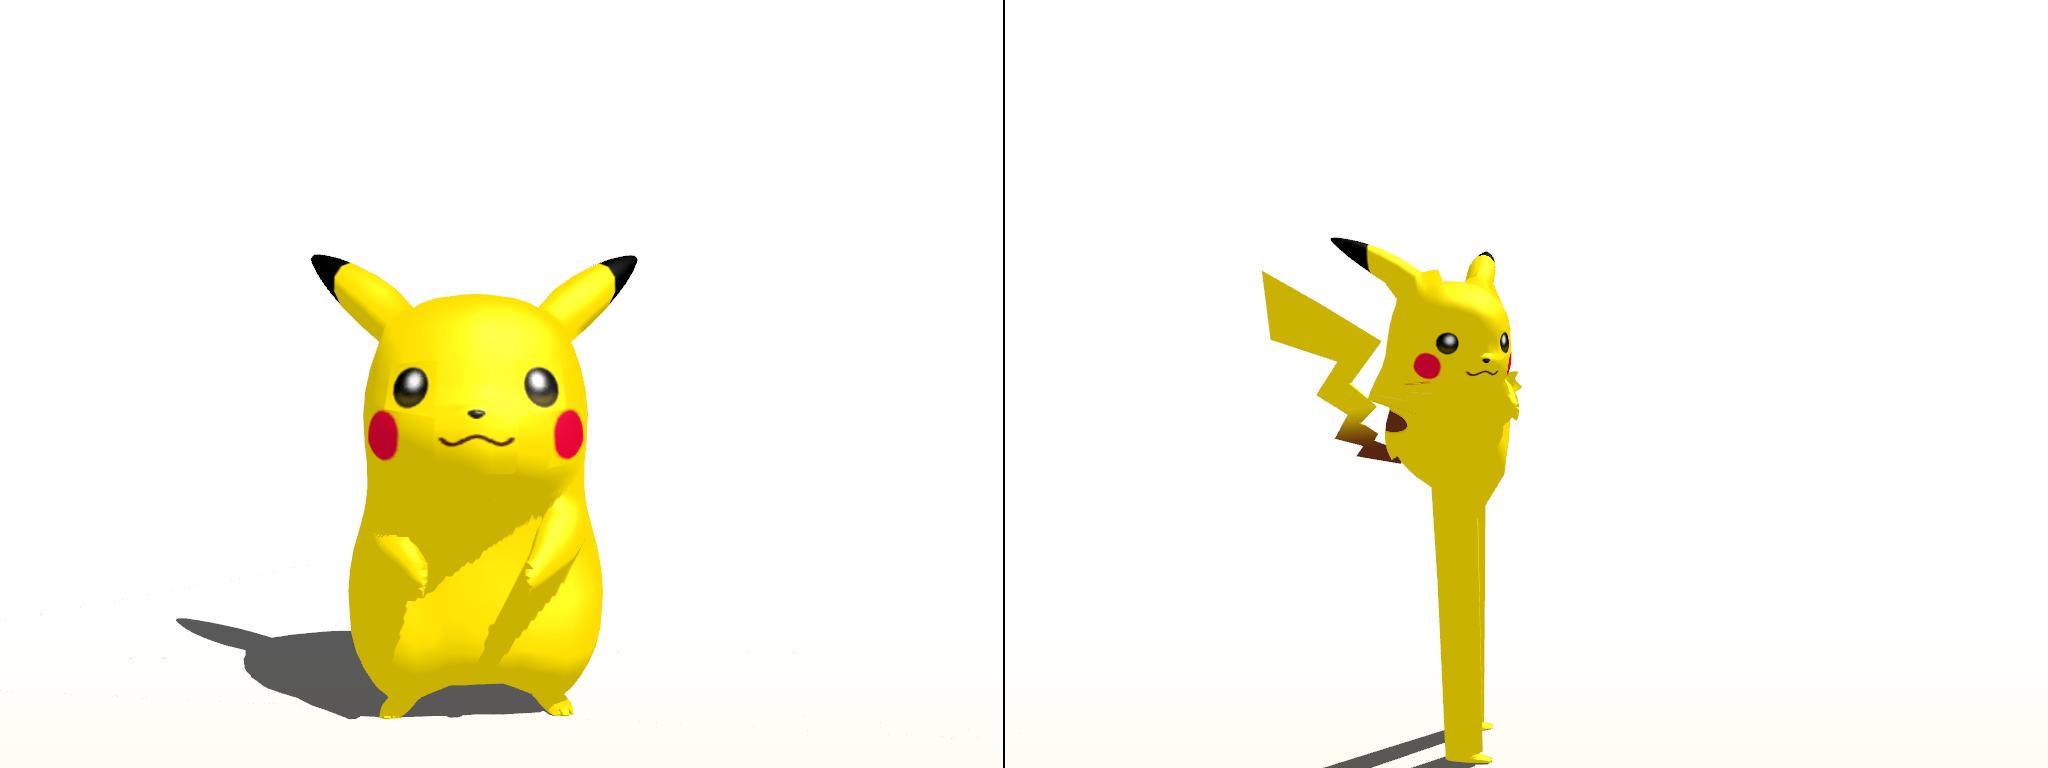 Pikachu and Longchu by JackFrost-LCDA on DeviantArt